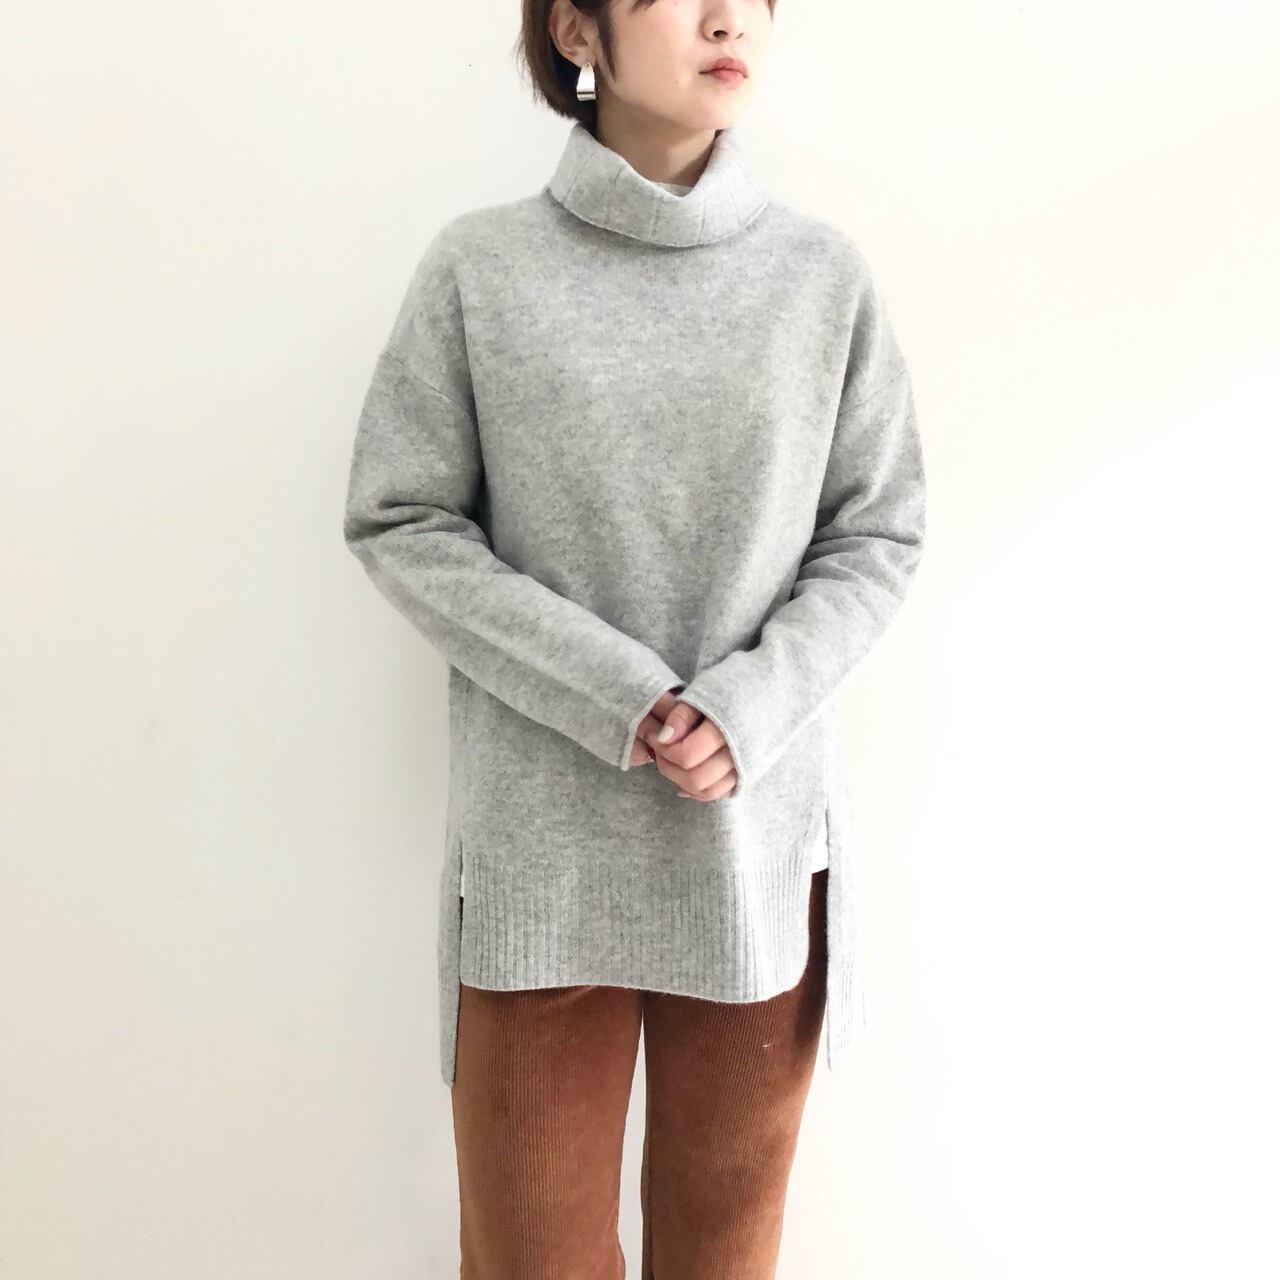 【 CYNICAL 】- 952-95087- tasmania lamb knit